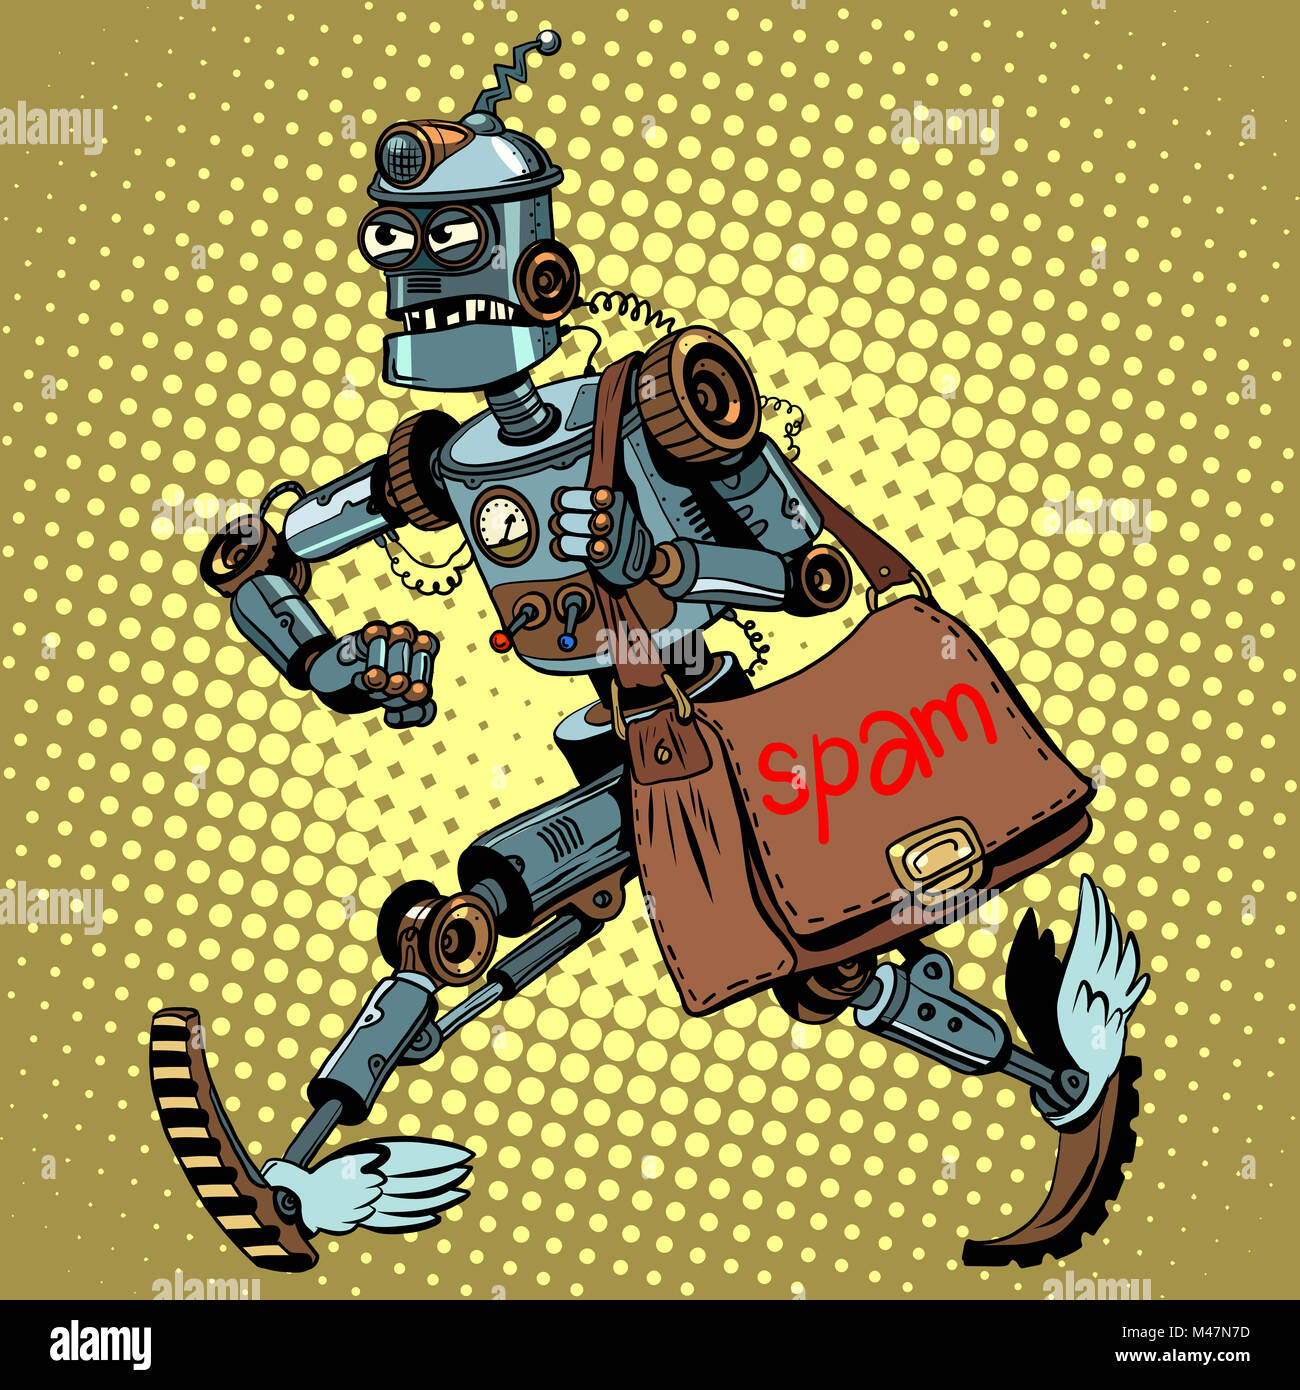 Elettronica robot spam postino email Immagini Stock